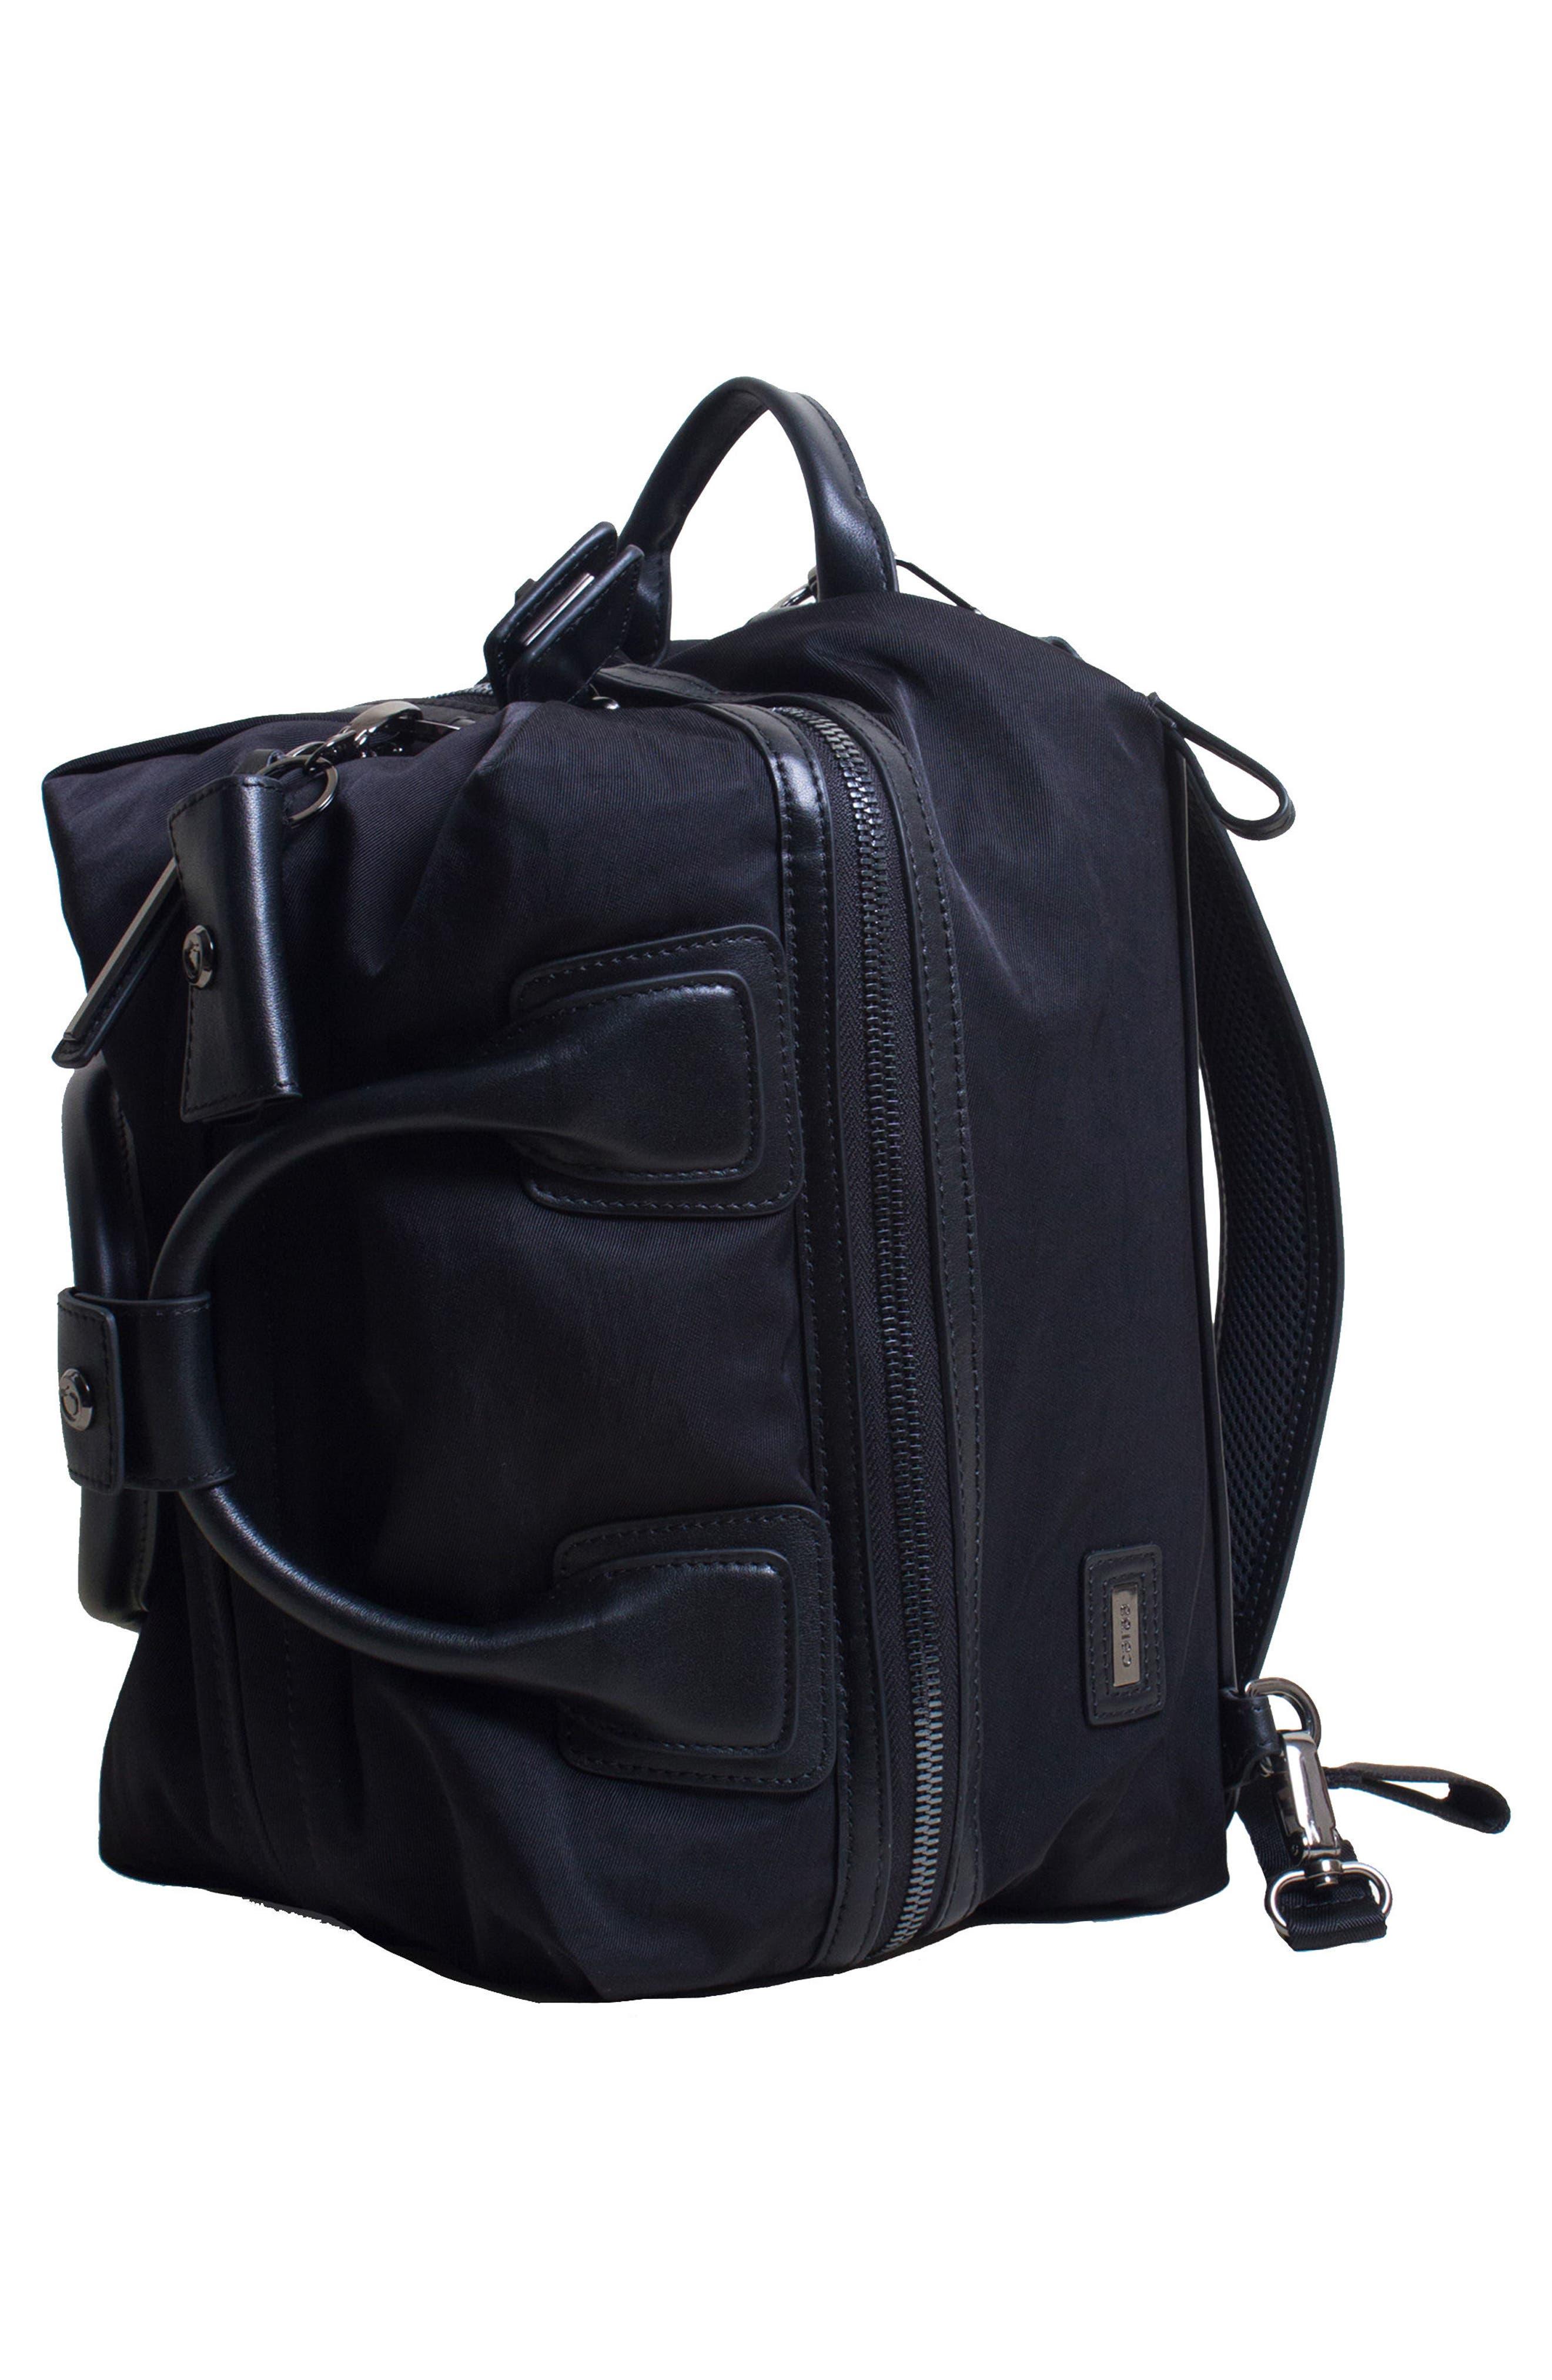 Studio Medium Duffel Backpack,                             Alternate thumbnail 5, color,                             BLACK